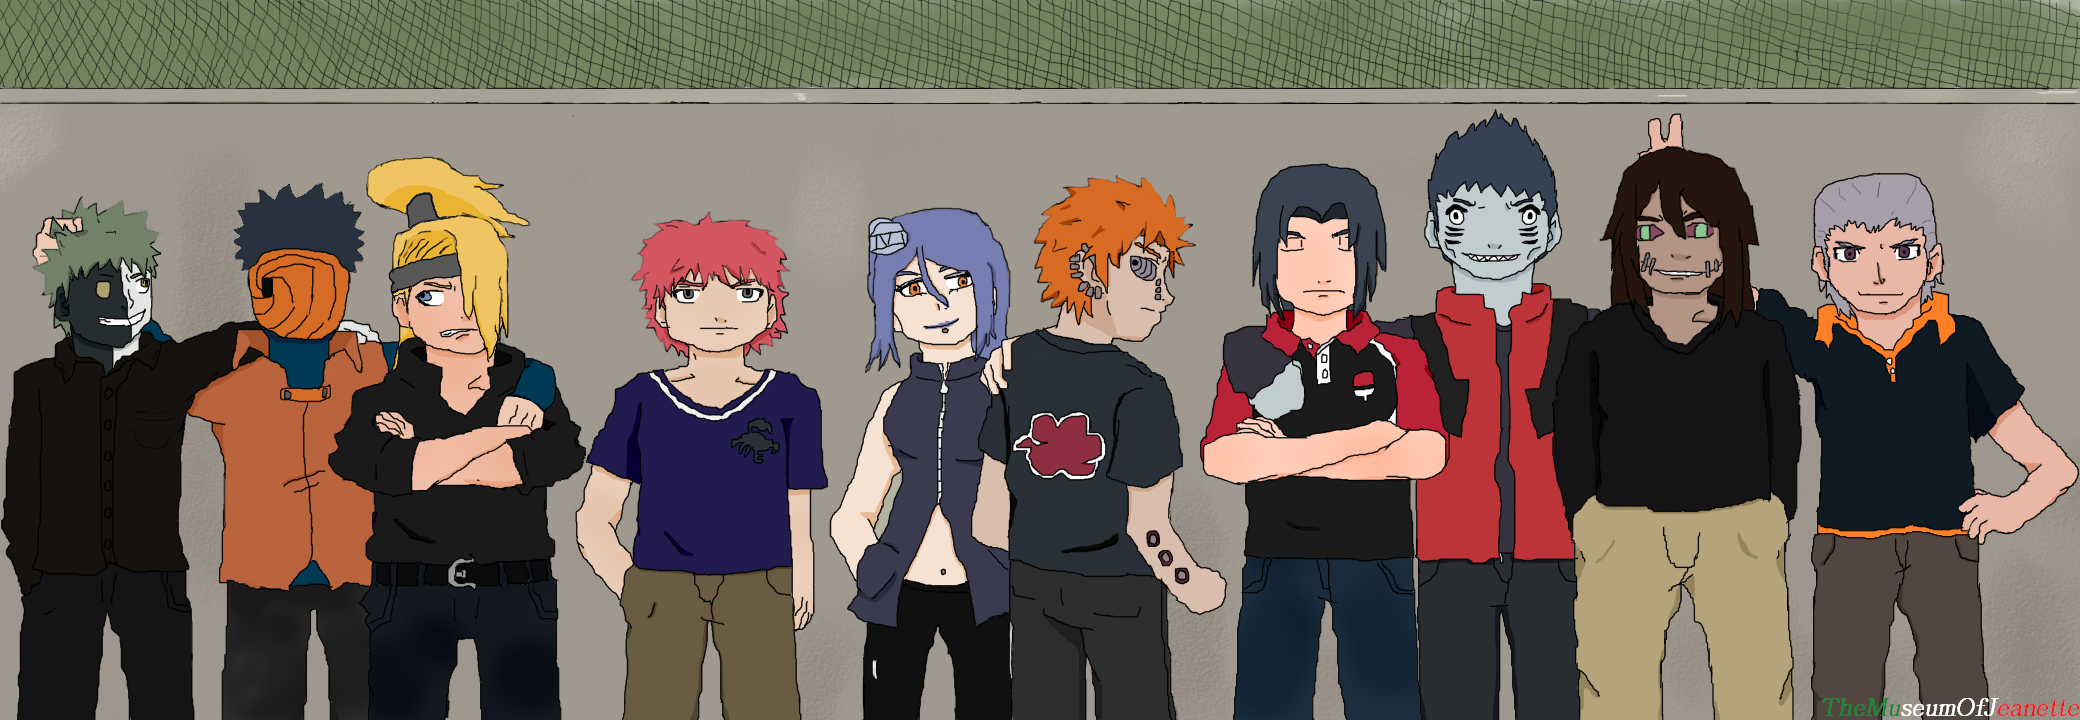 team akatsuki ~ naruto shippudenthemuseumofjeanette on deviantart